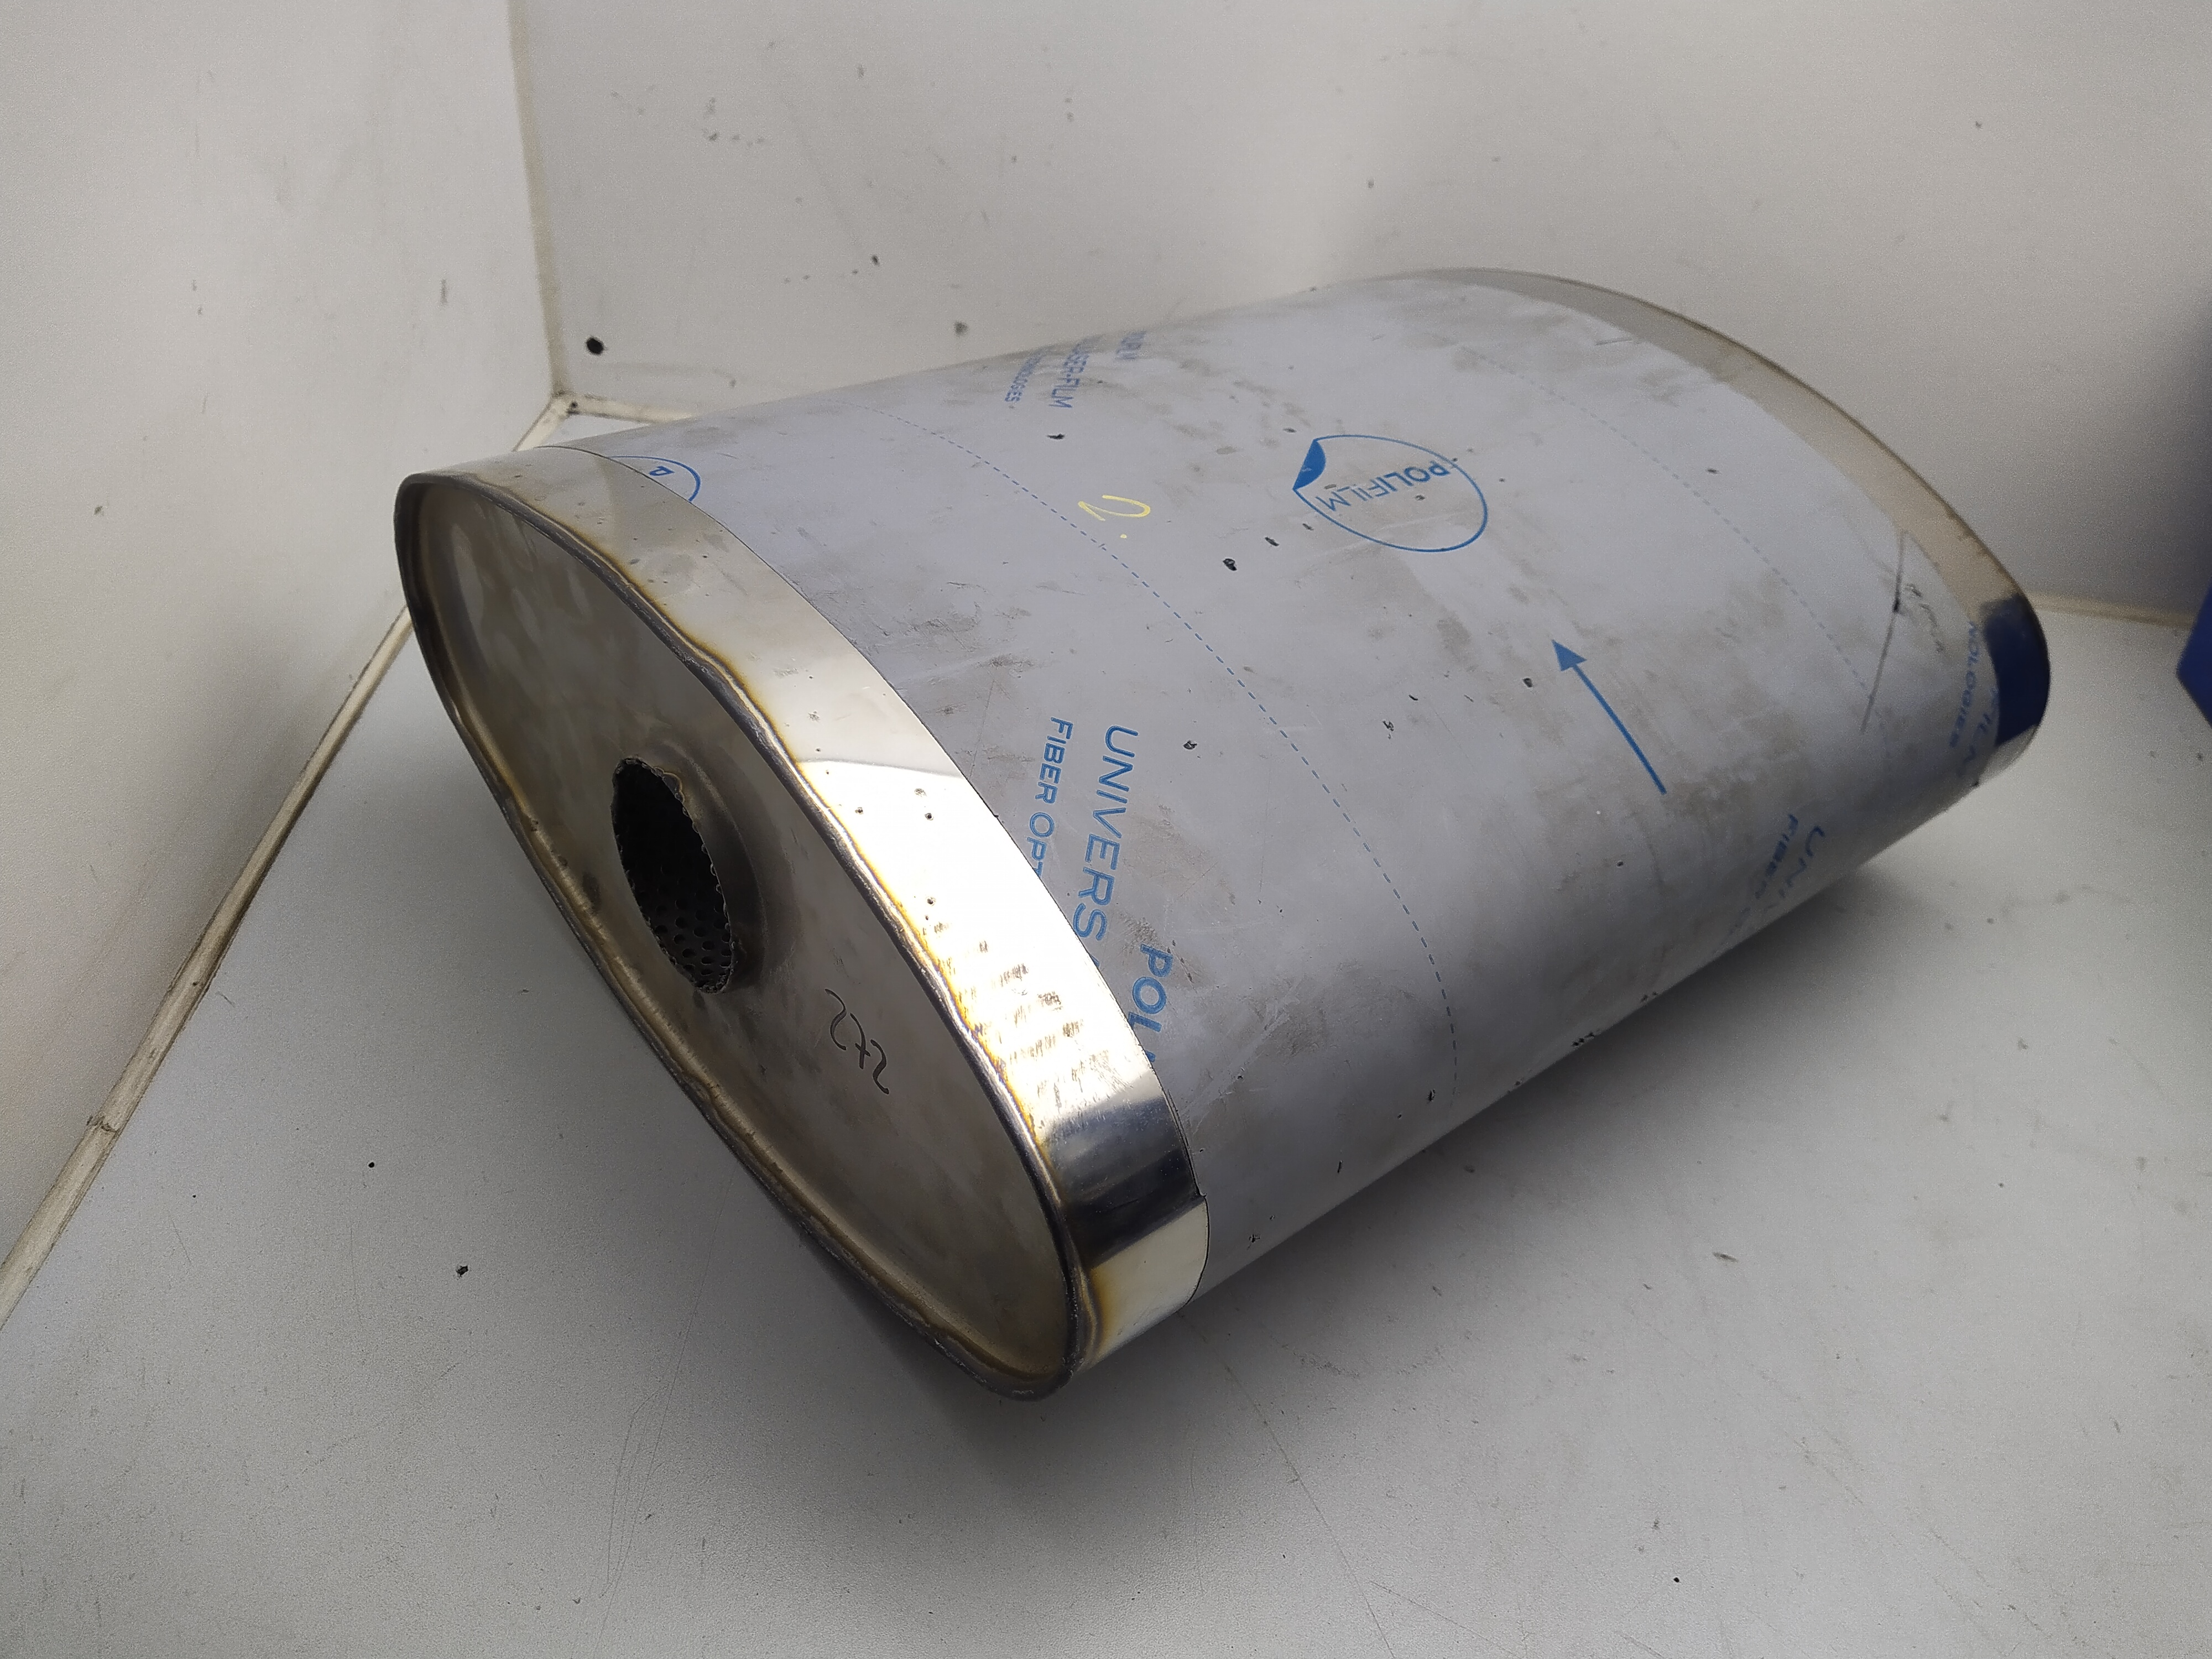 "2,5"" 2.5 zoll Schalldämpfer oval ohne Stutzen - 56x160mm, d1Ø 63,5mm, Länge: 420mm"